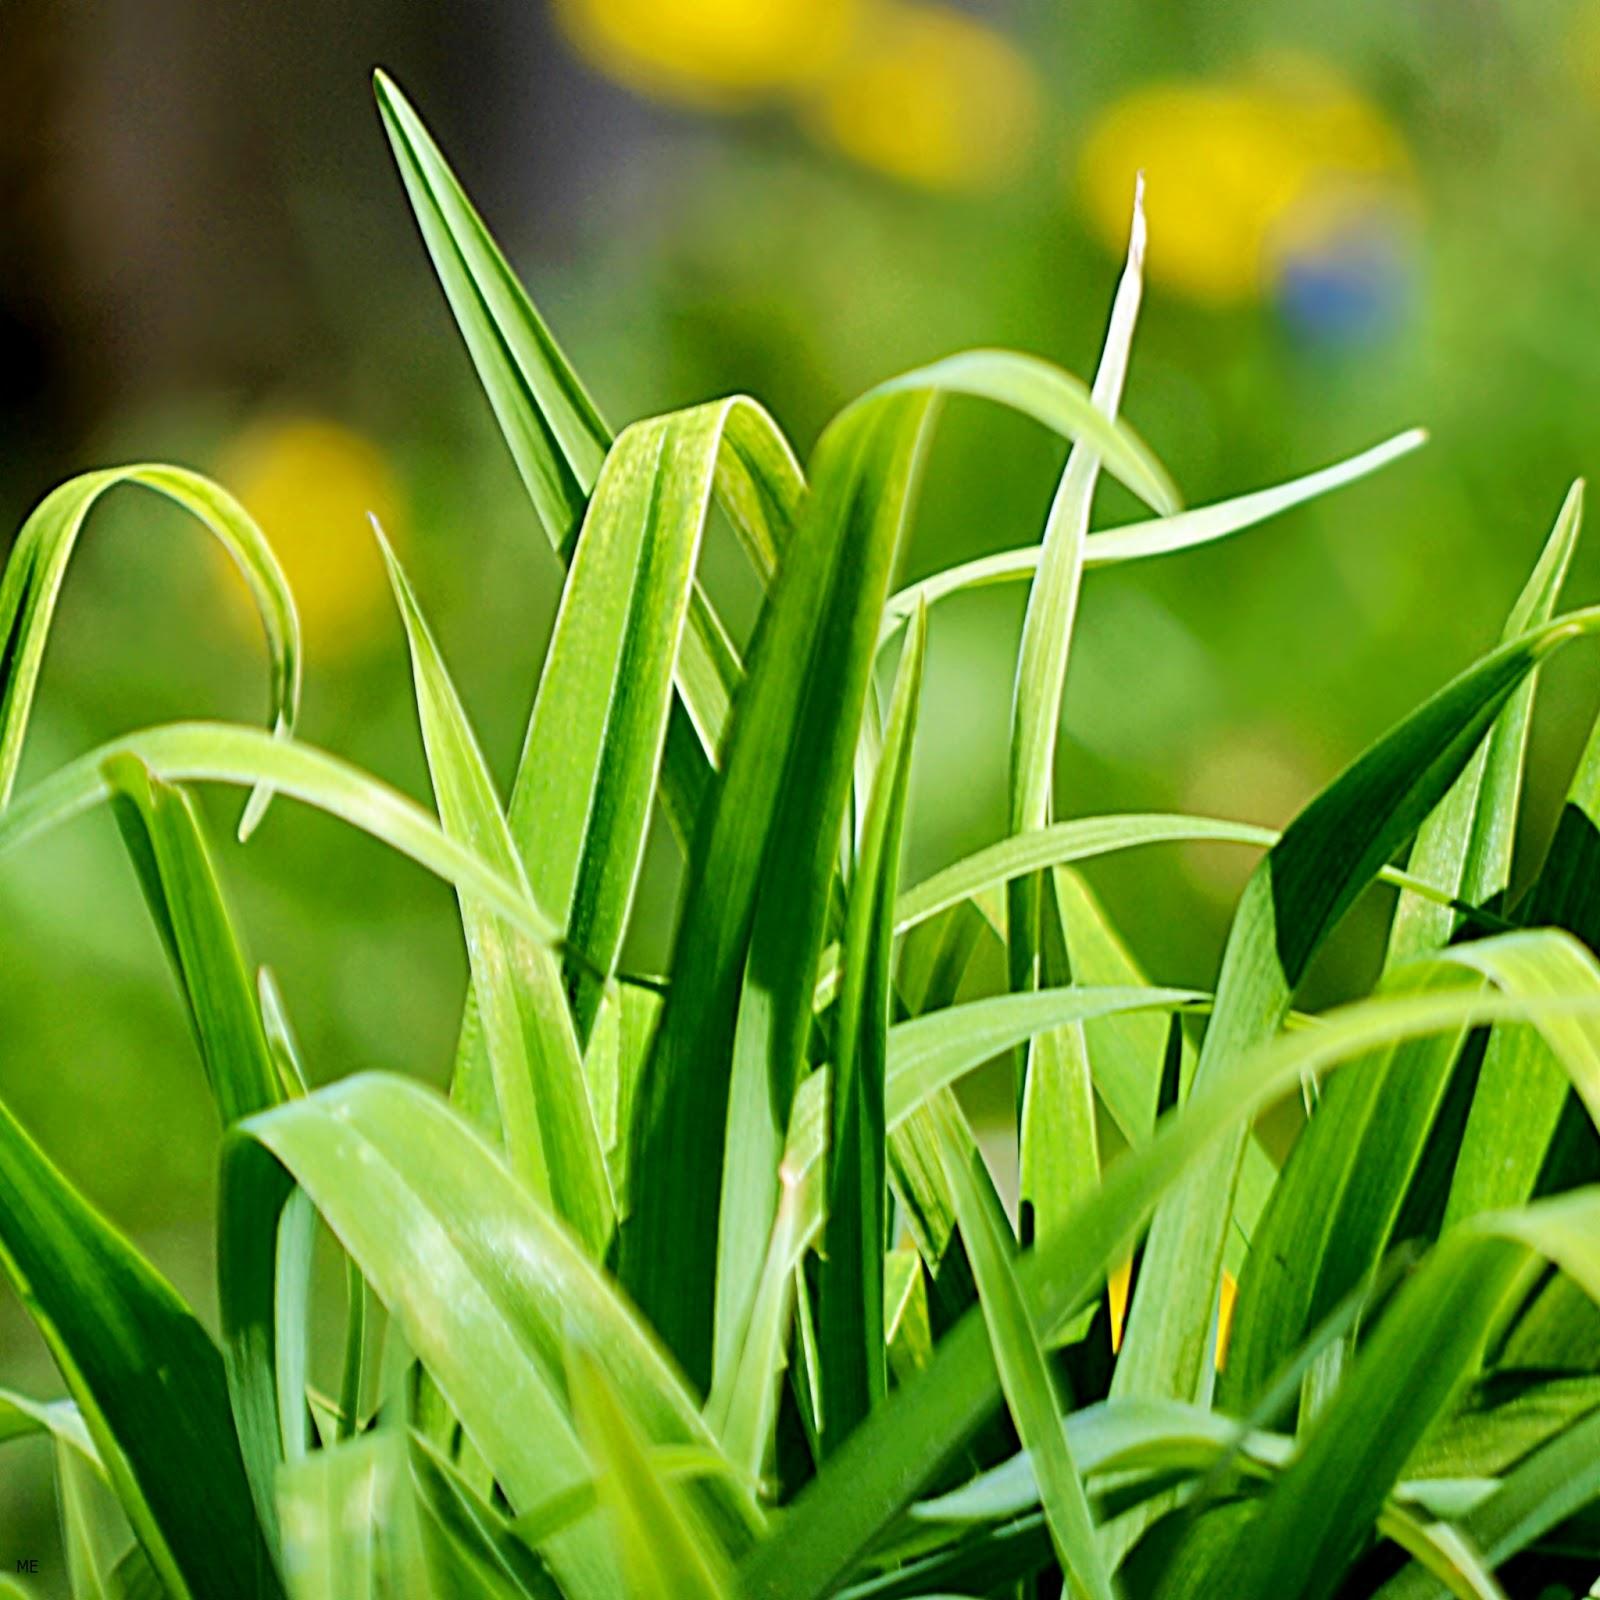 http://2.bp.blogspot.com/-a4ksmpA3MPQ/UUchc3AIt4I/AAAAAAAADx4/BRGbLV0uAvs/s1600/Green-Nature-Grass-ipad4-iphone5-hd-tablet-wallpaper.jpg